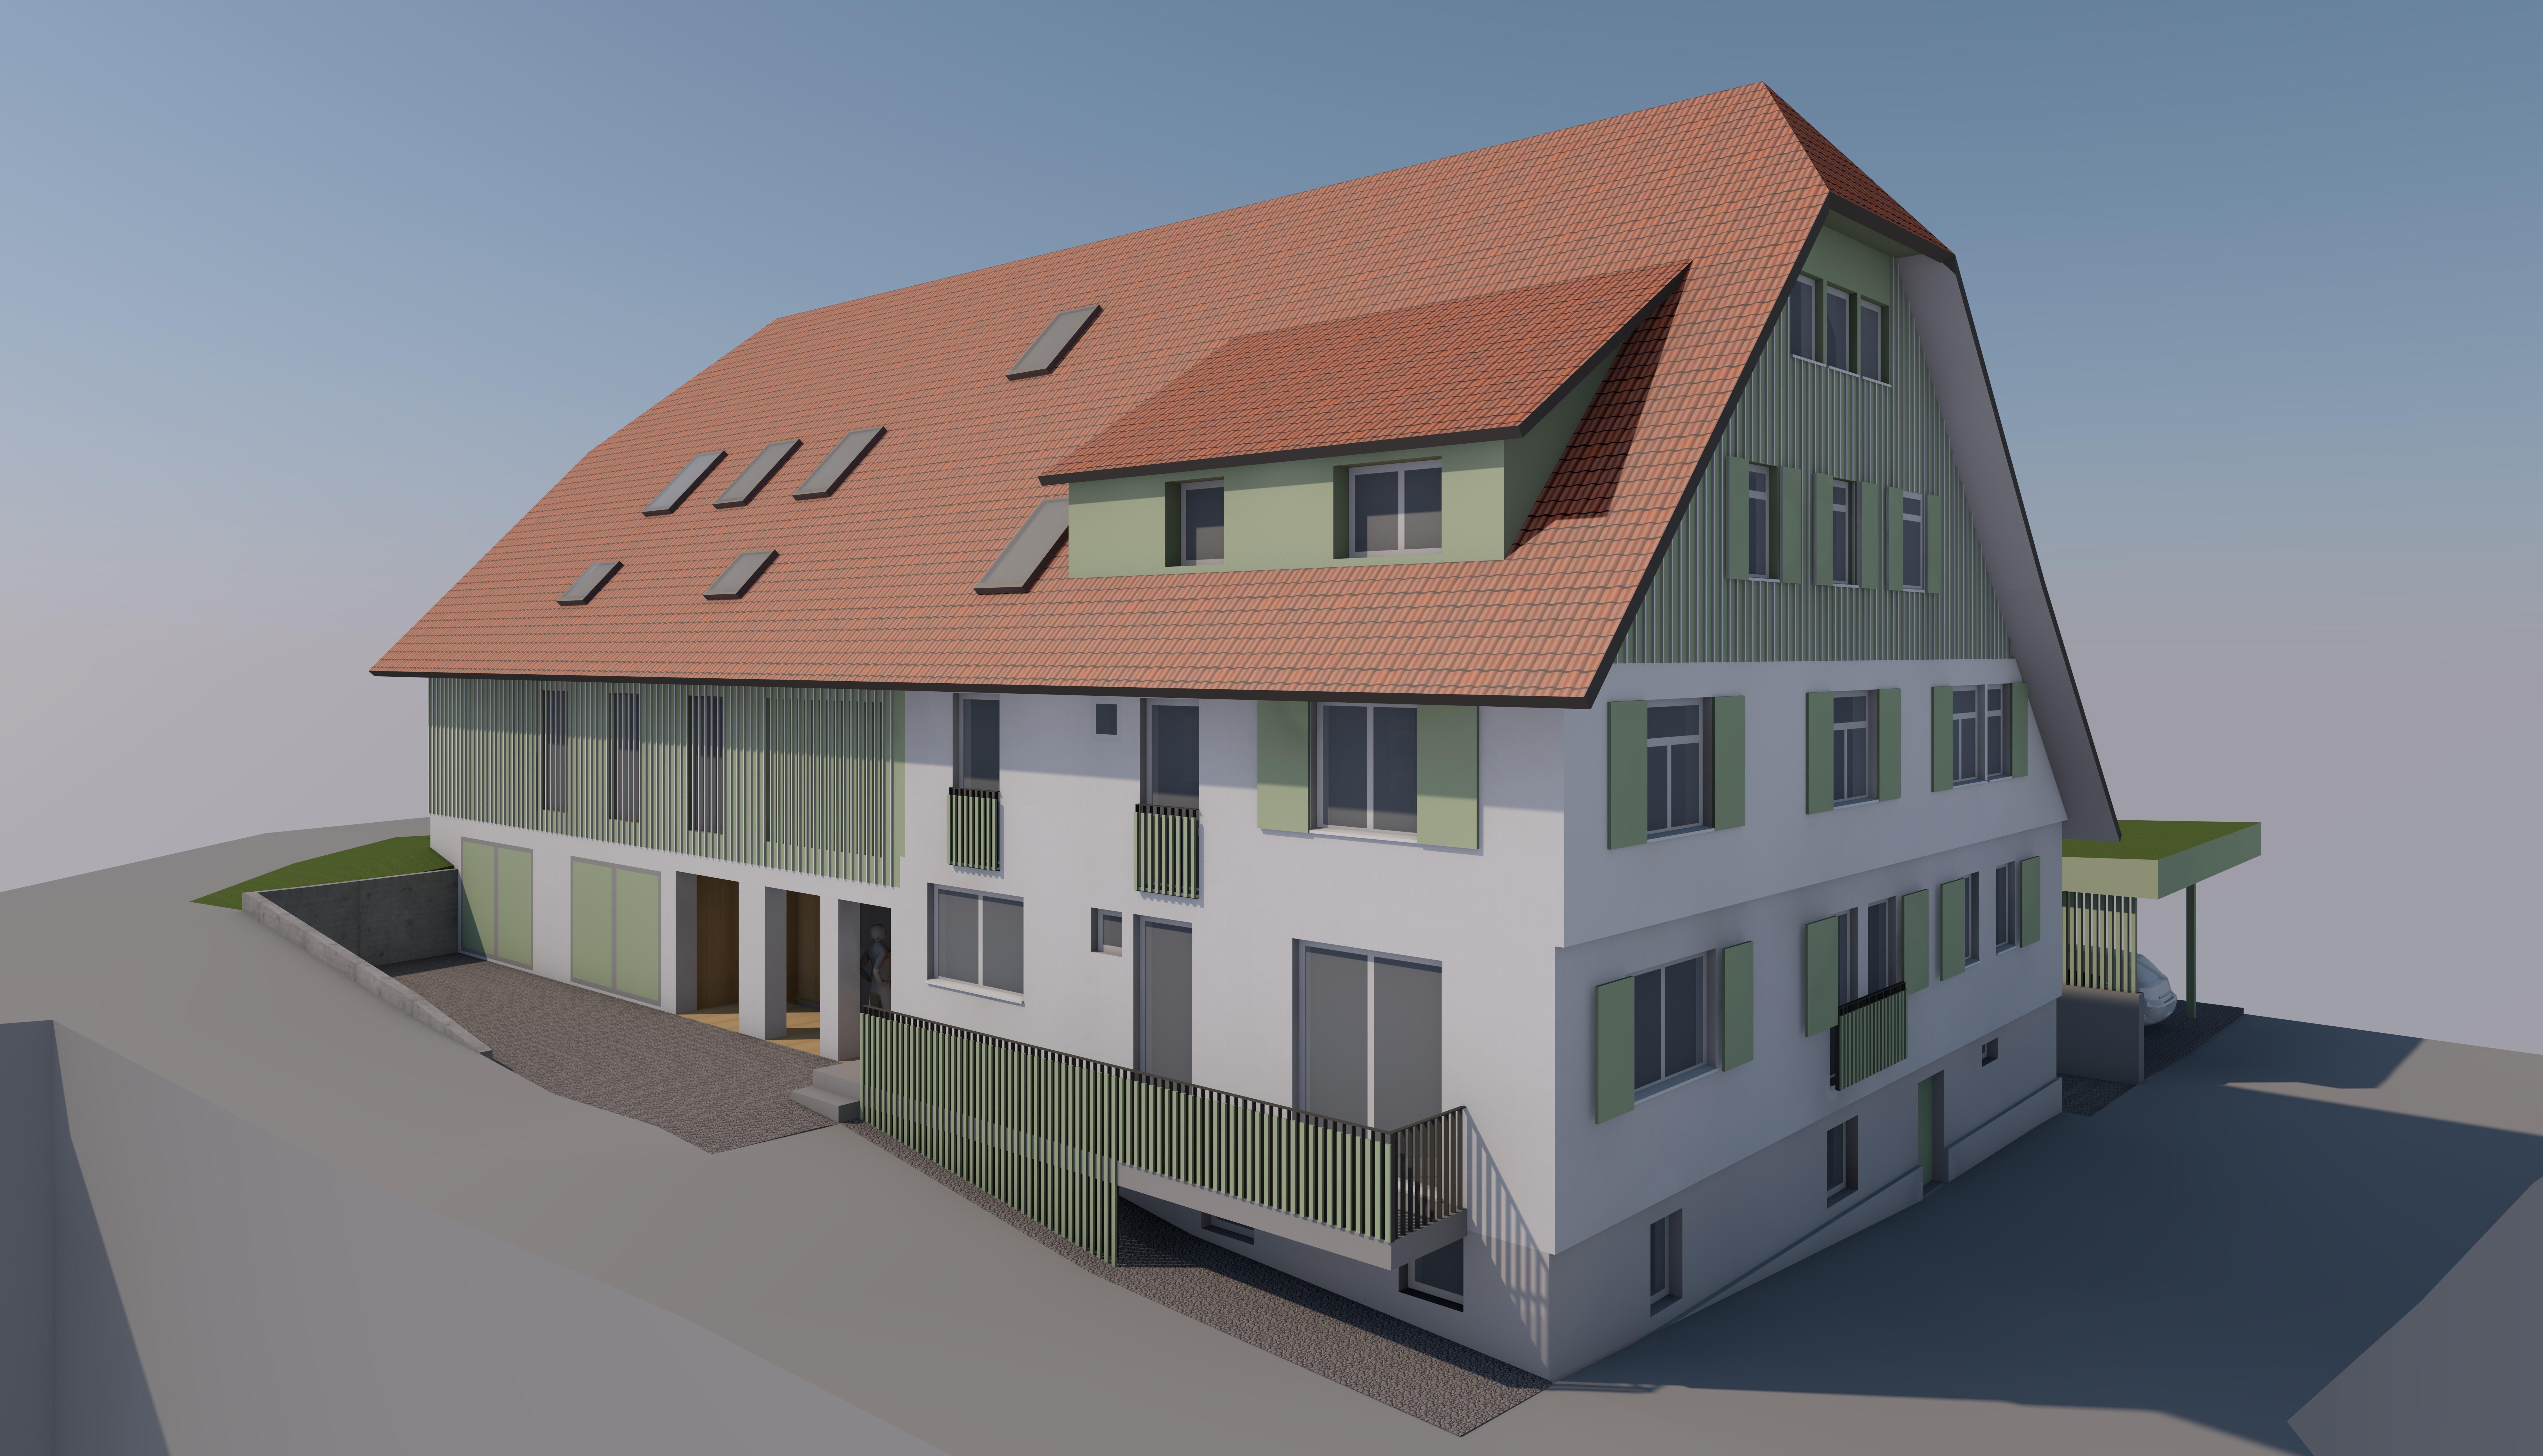 Schwarzwaldhof-CAD-Modell